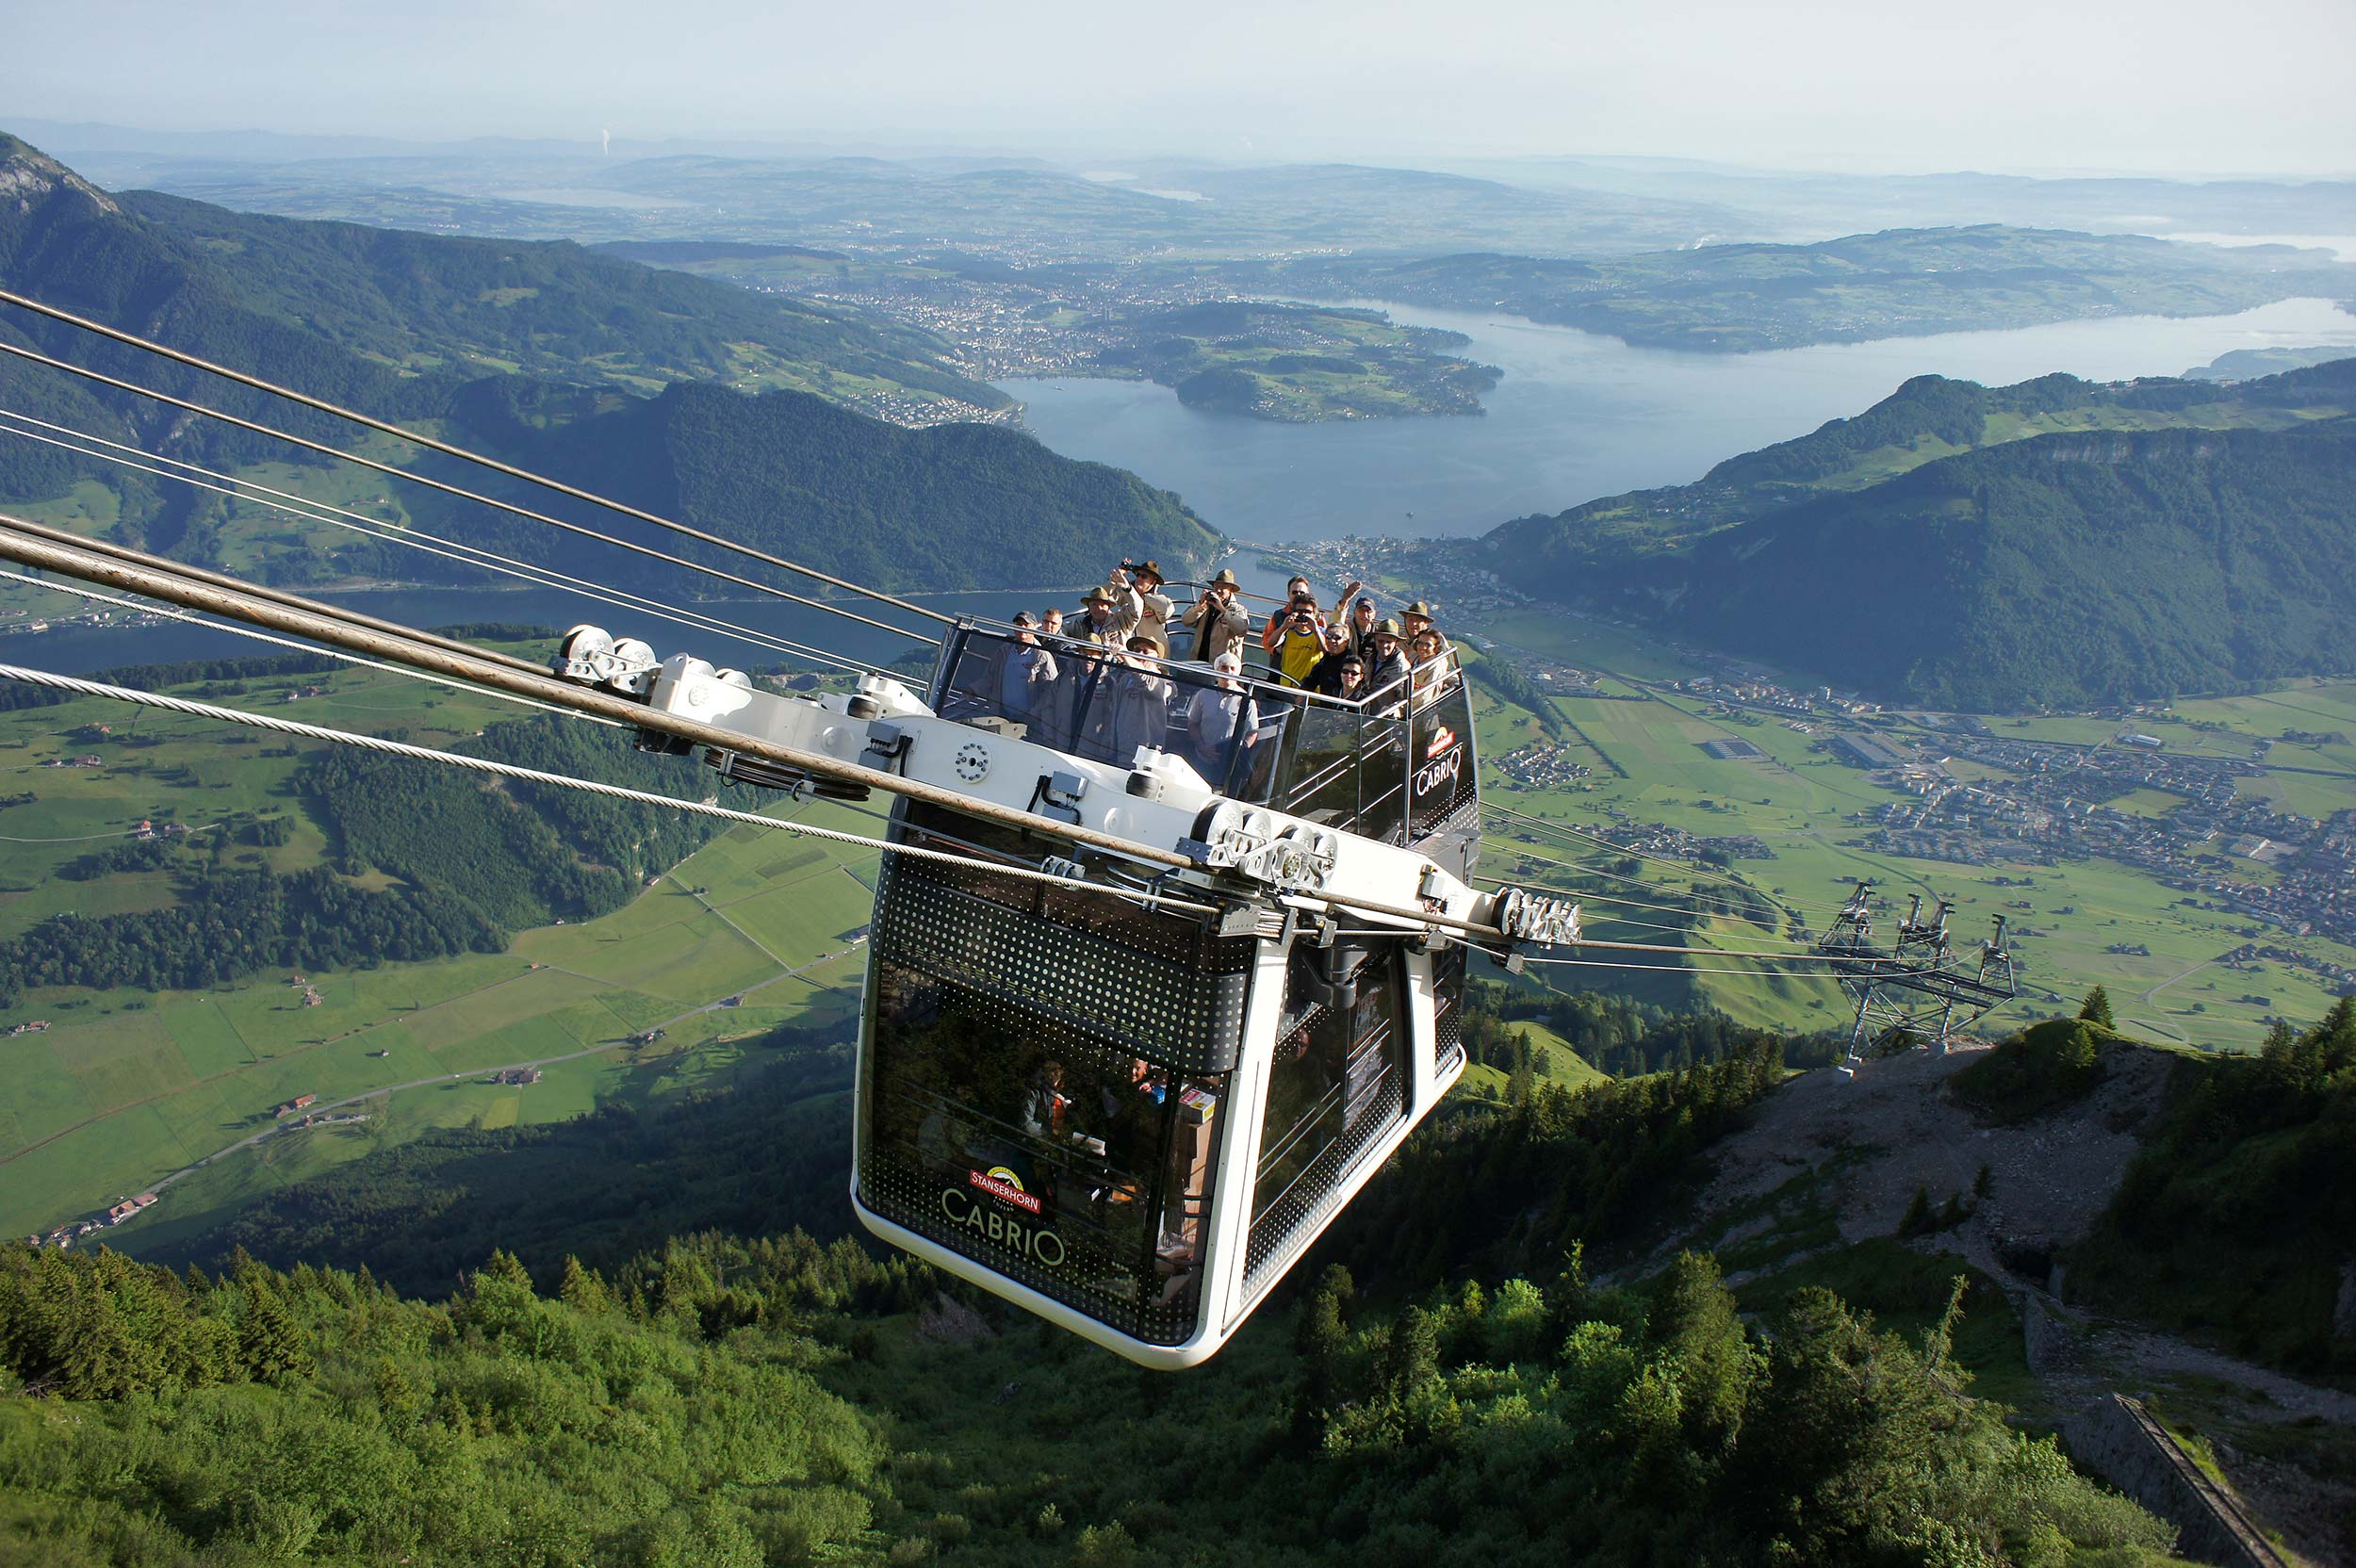 CabriO Stanserhorn | Suisse Tourisme